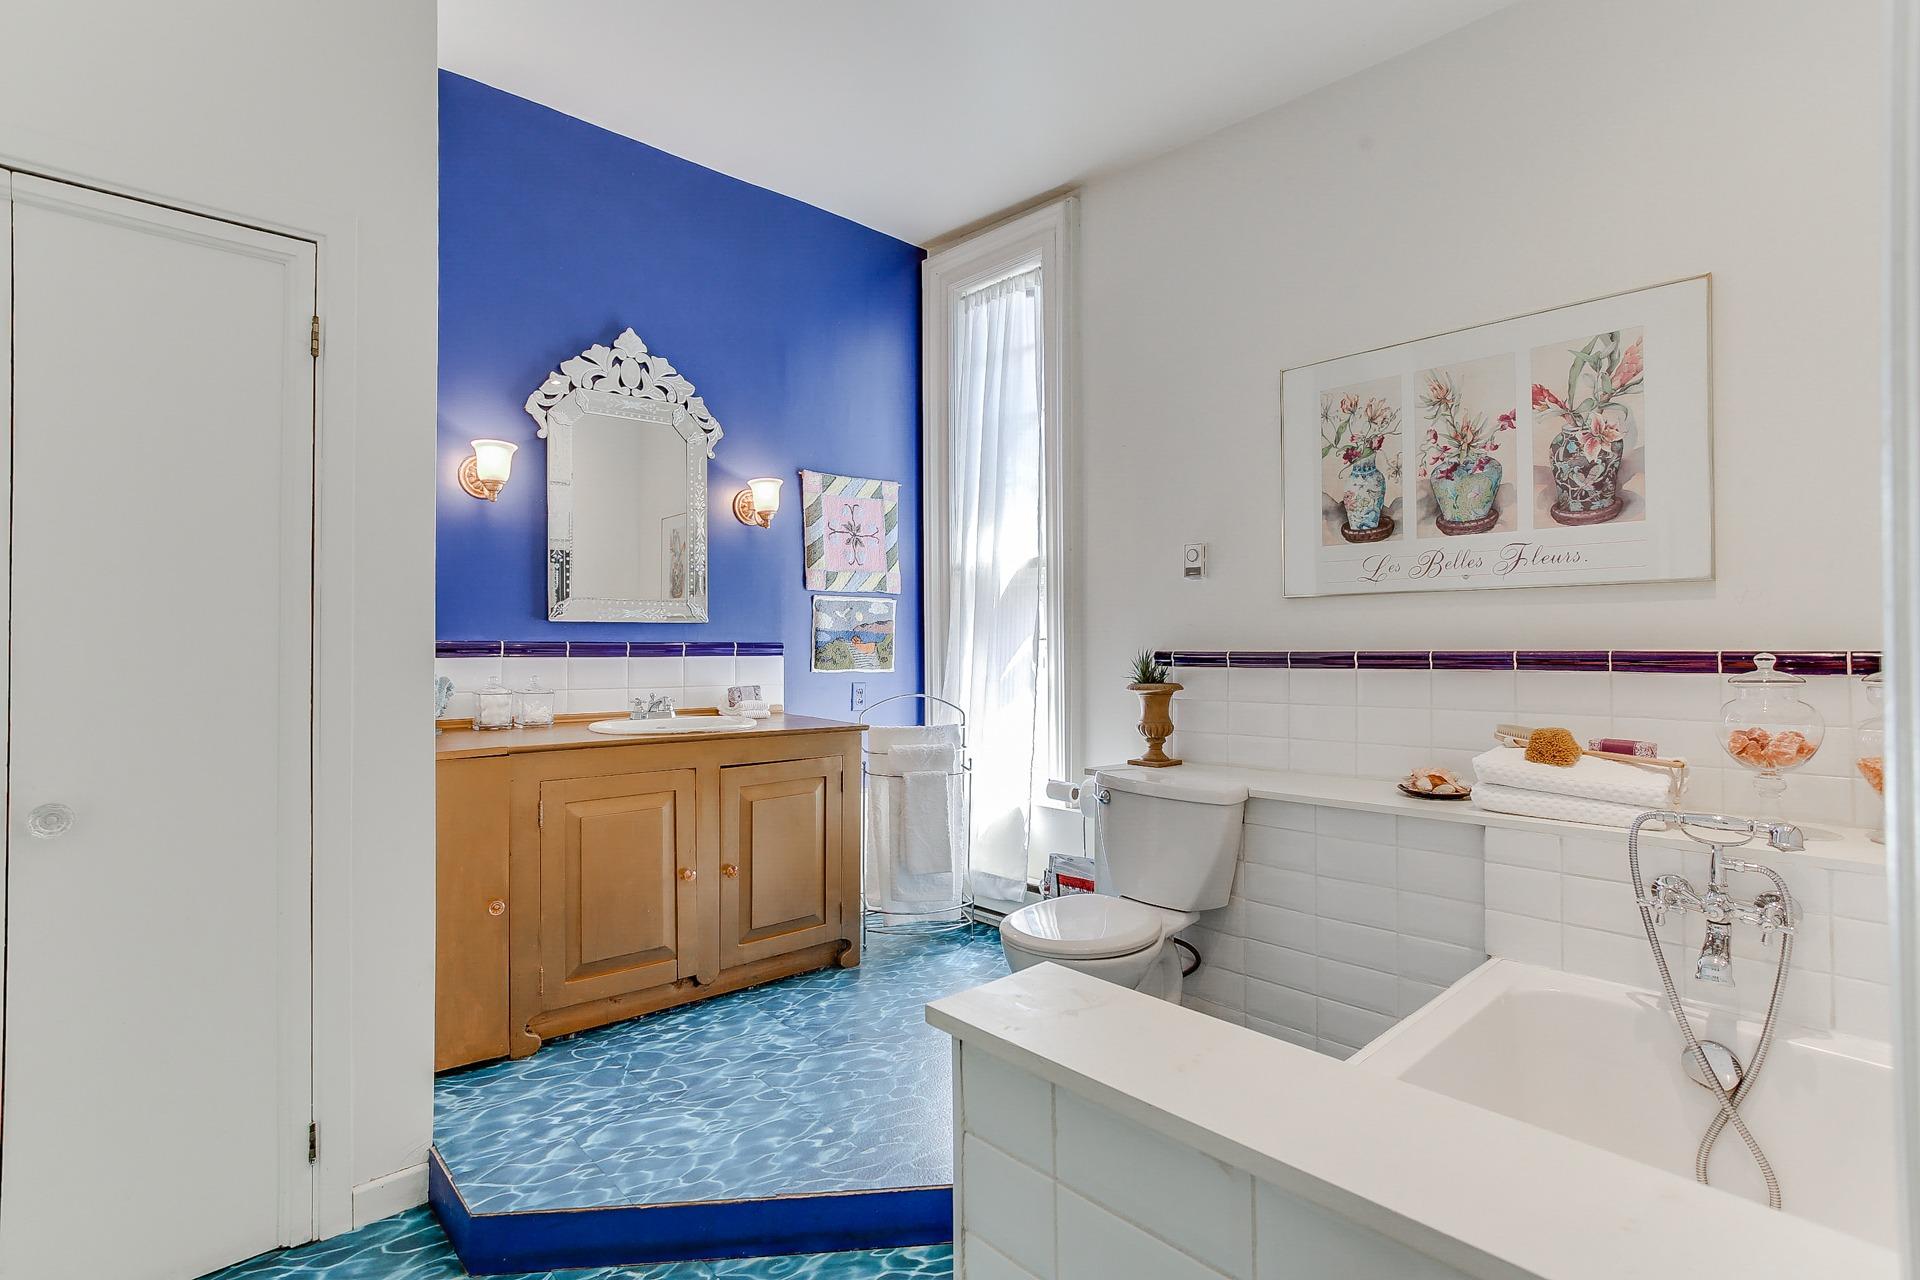 34_1stbathroom11